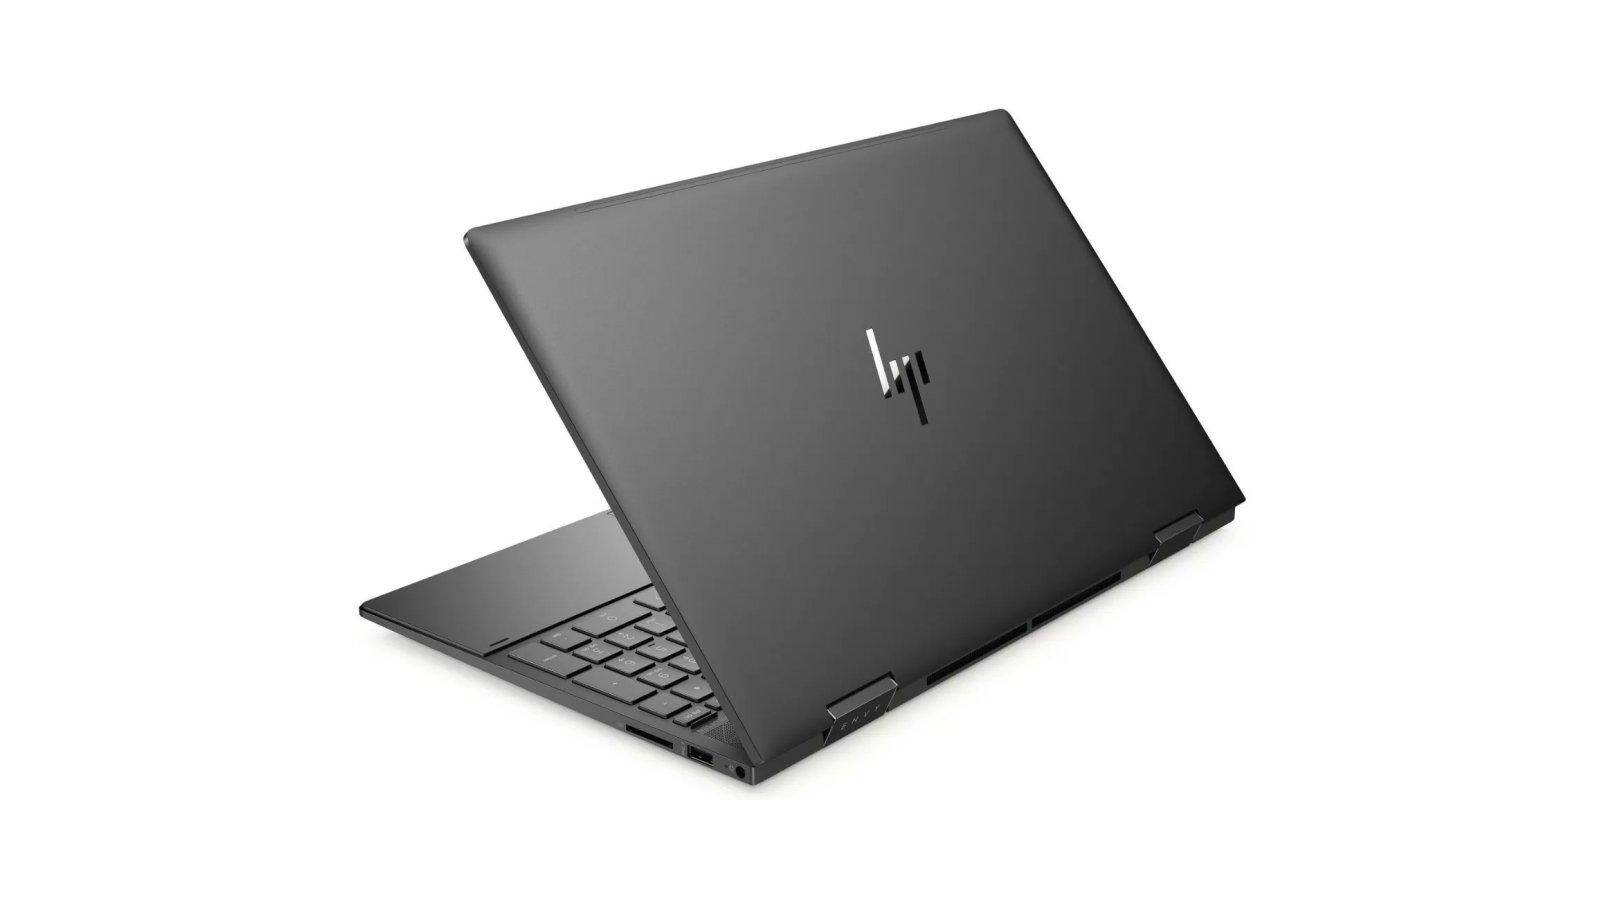 HP Envy x360 2020